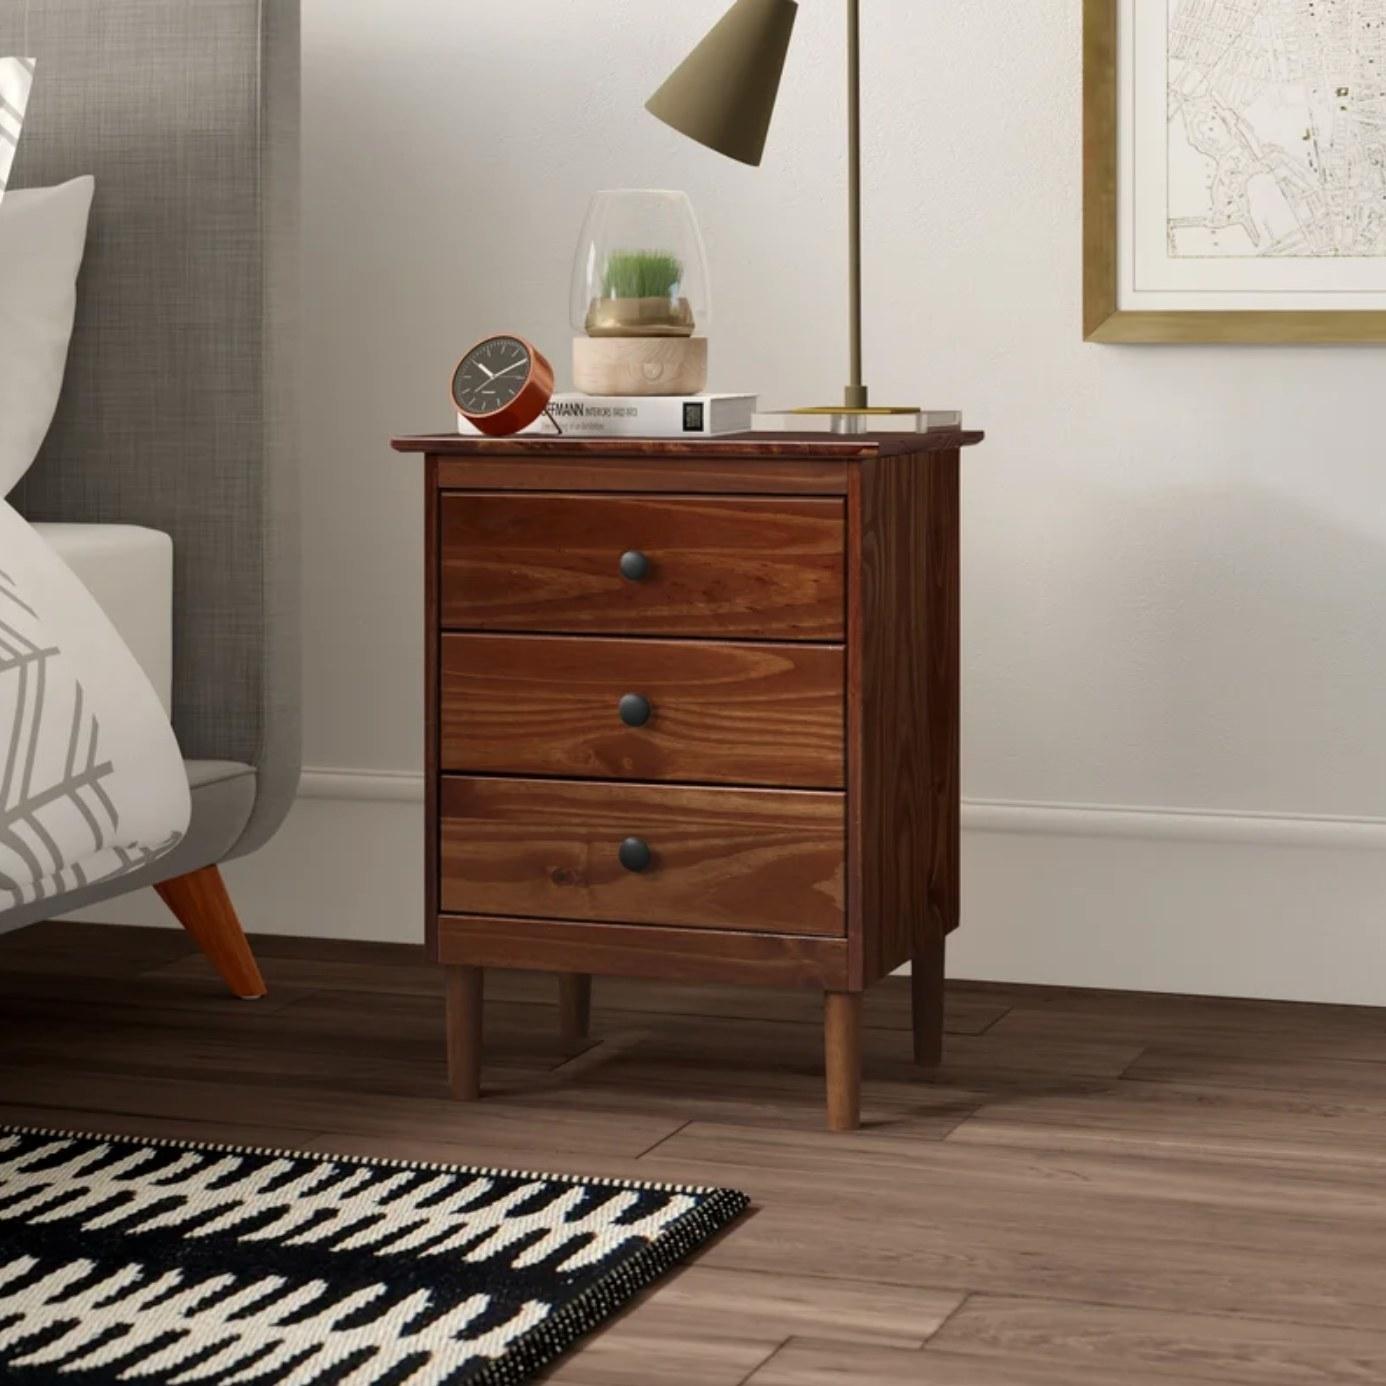 The three drawer nightstand in walnut